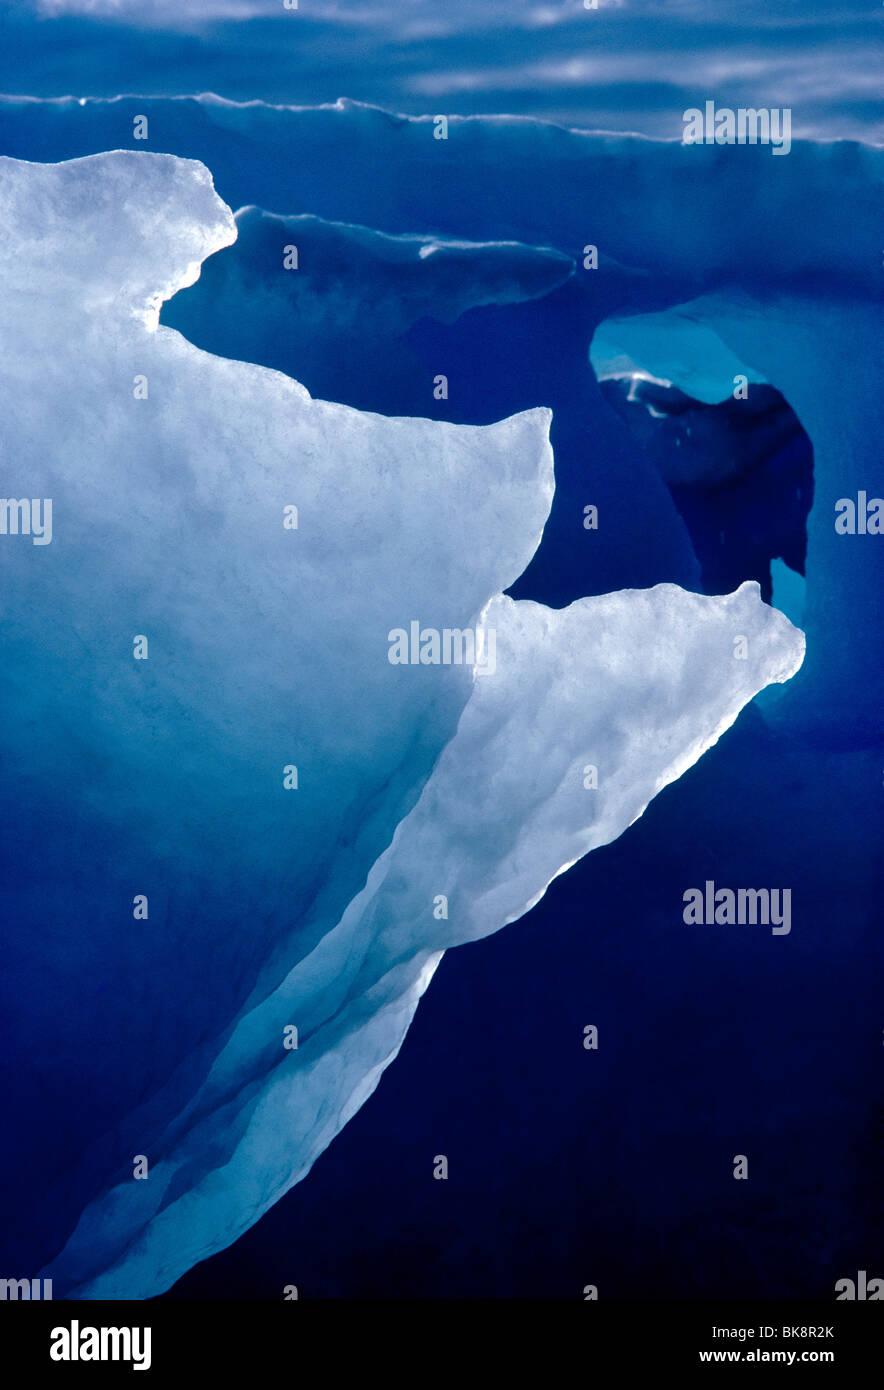 Abstract view of backlit iceberg formation at Kekerten Historic Park, Kekerten Island, Nunavut, Canada - Stock Image